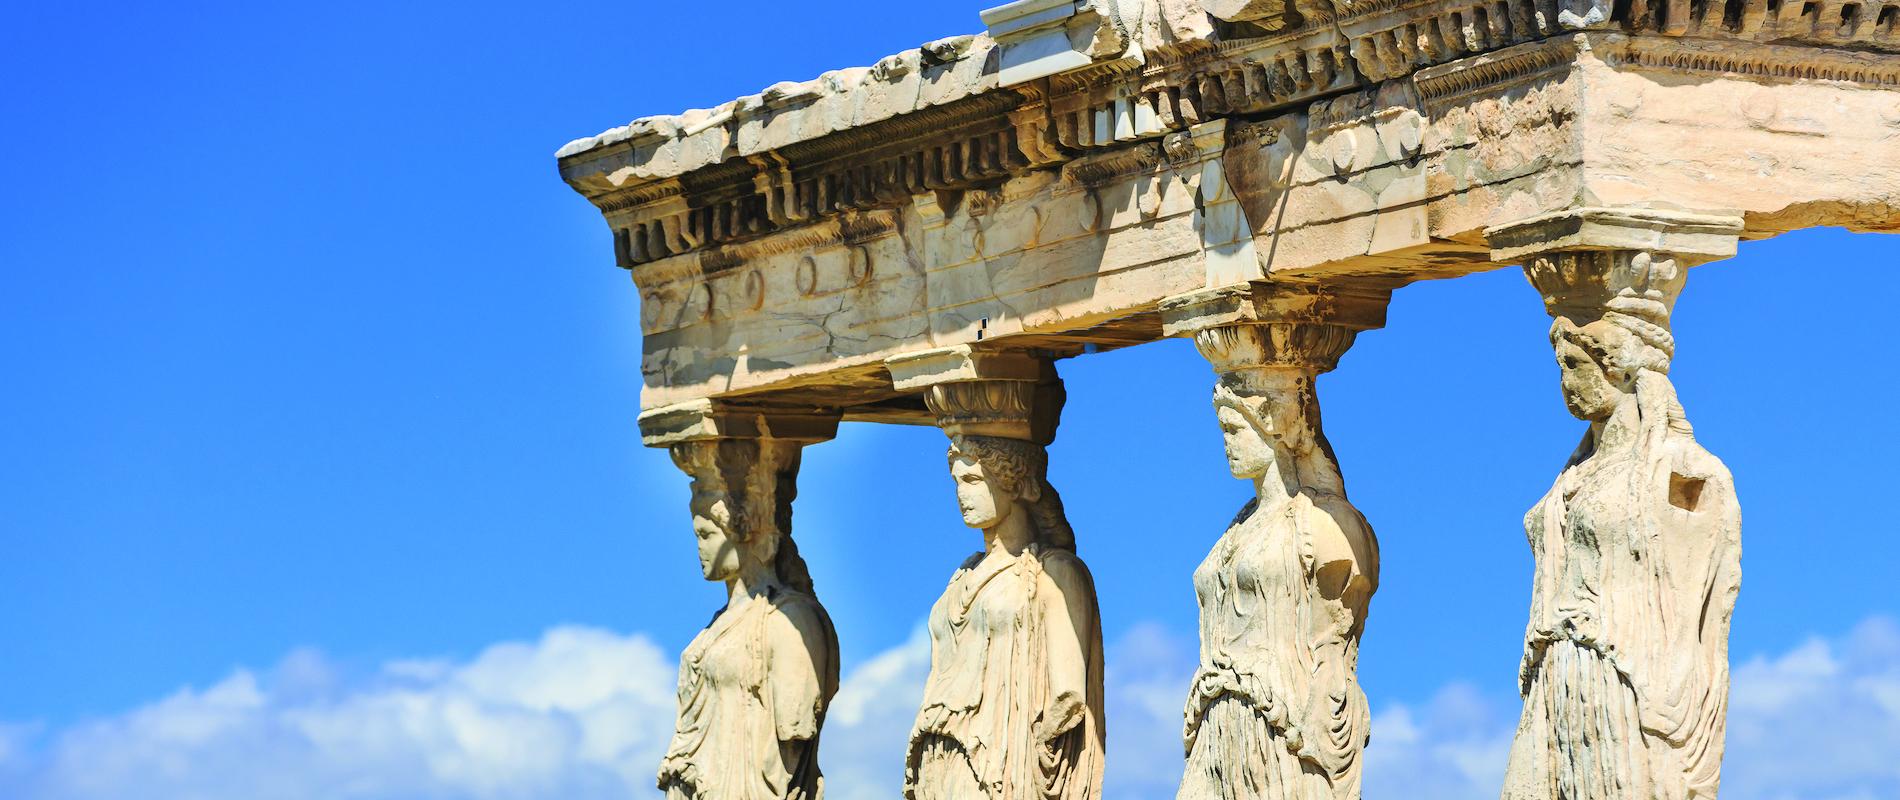 shutterstock_240320500 Caryatids Athens Greece cmyk.jpg